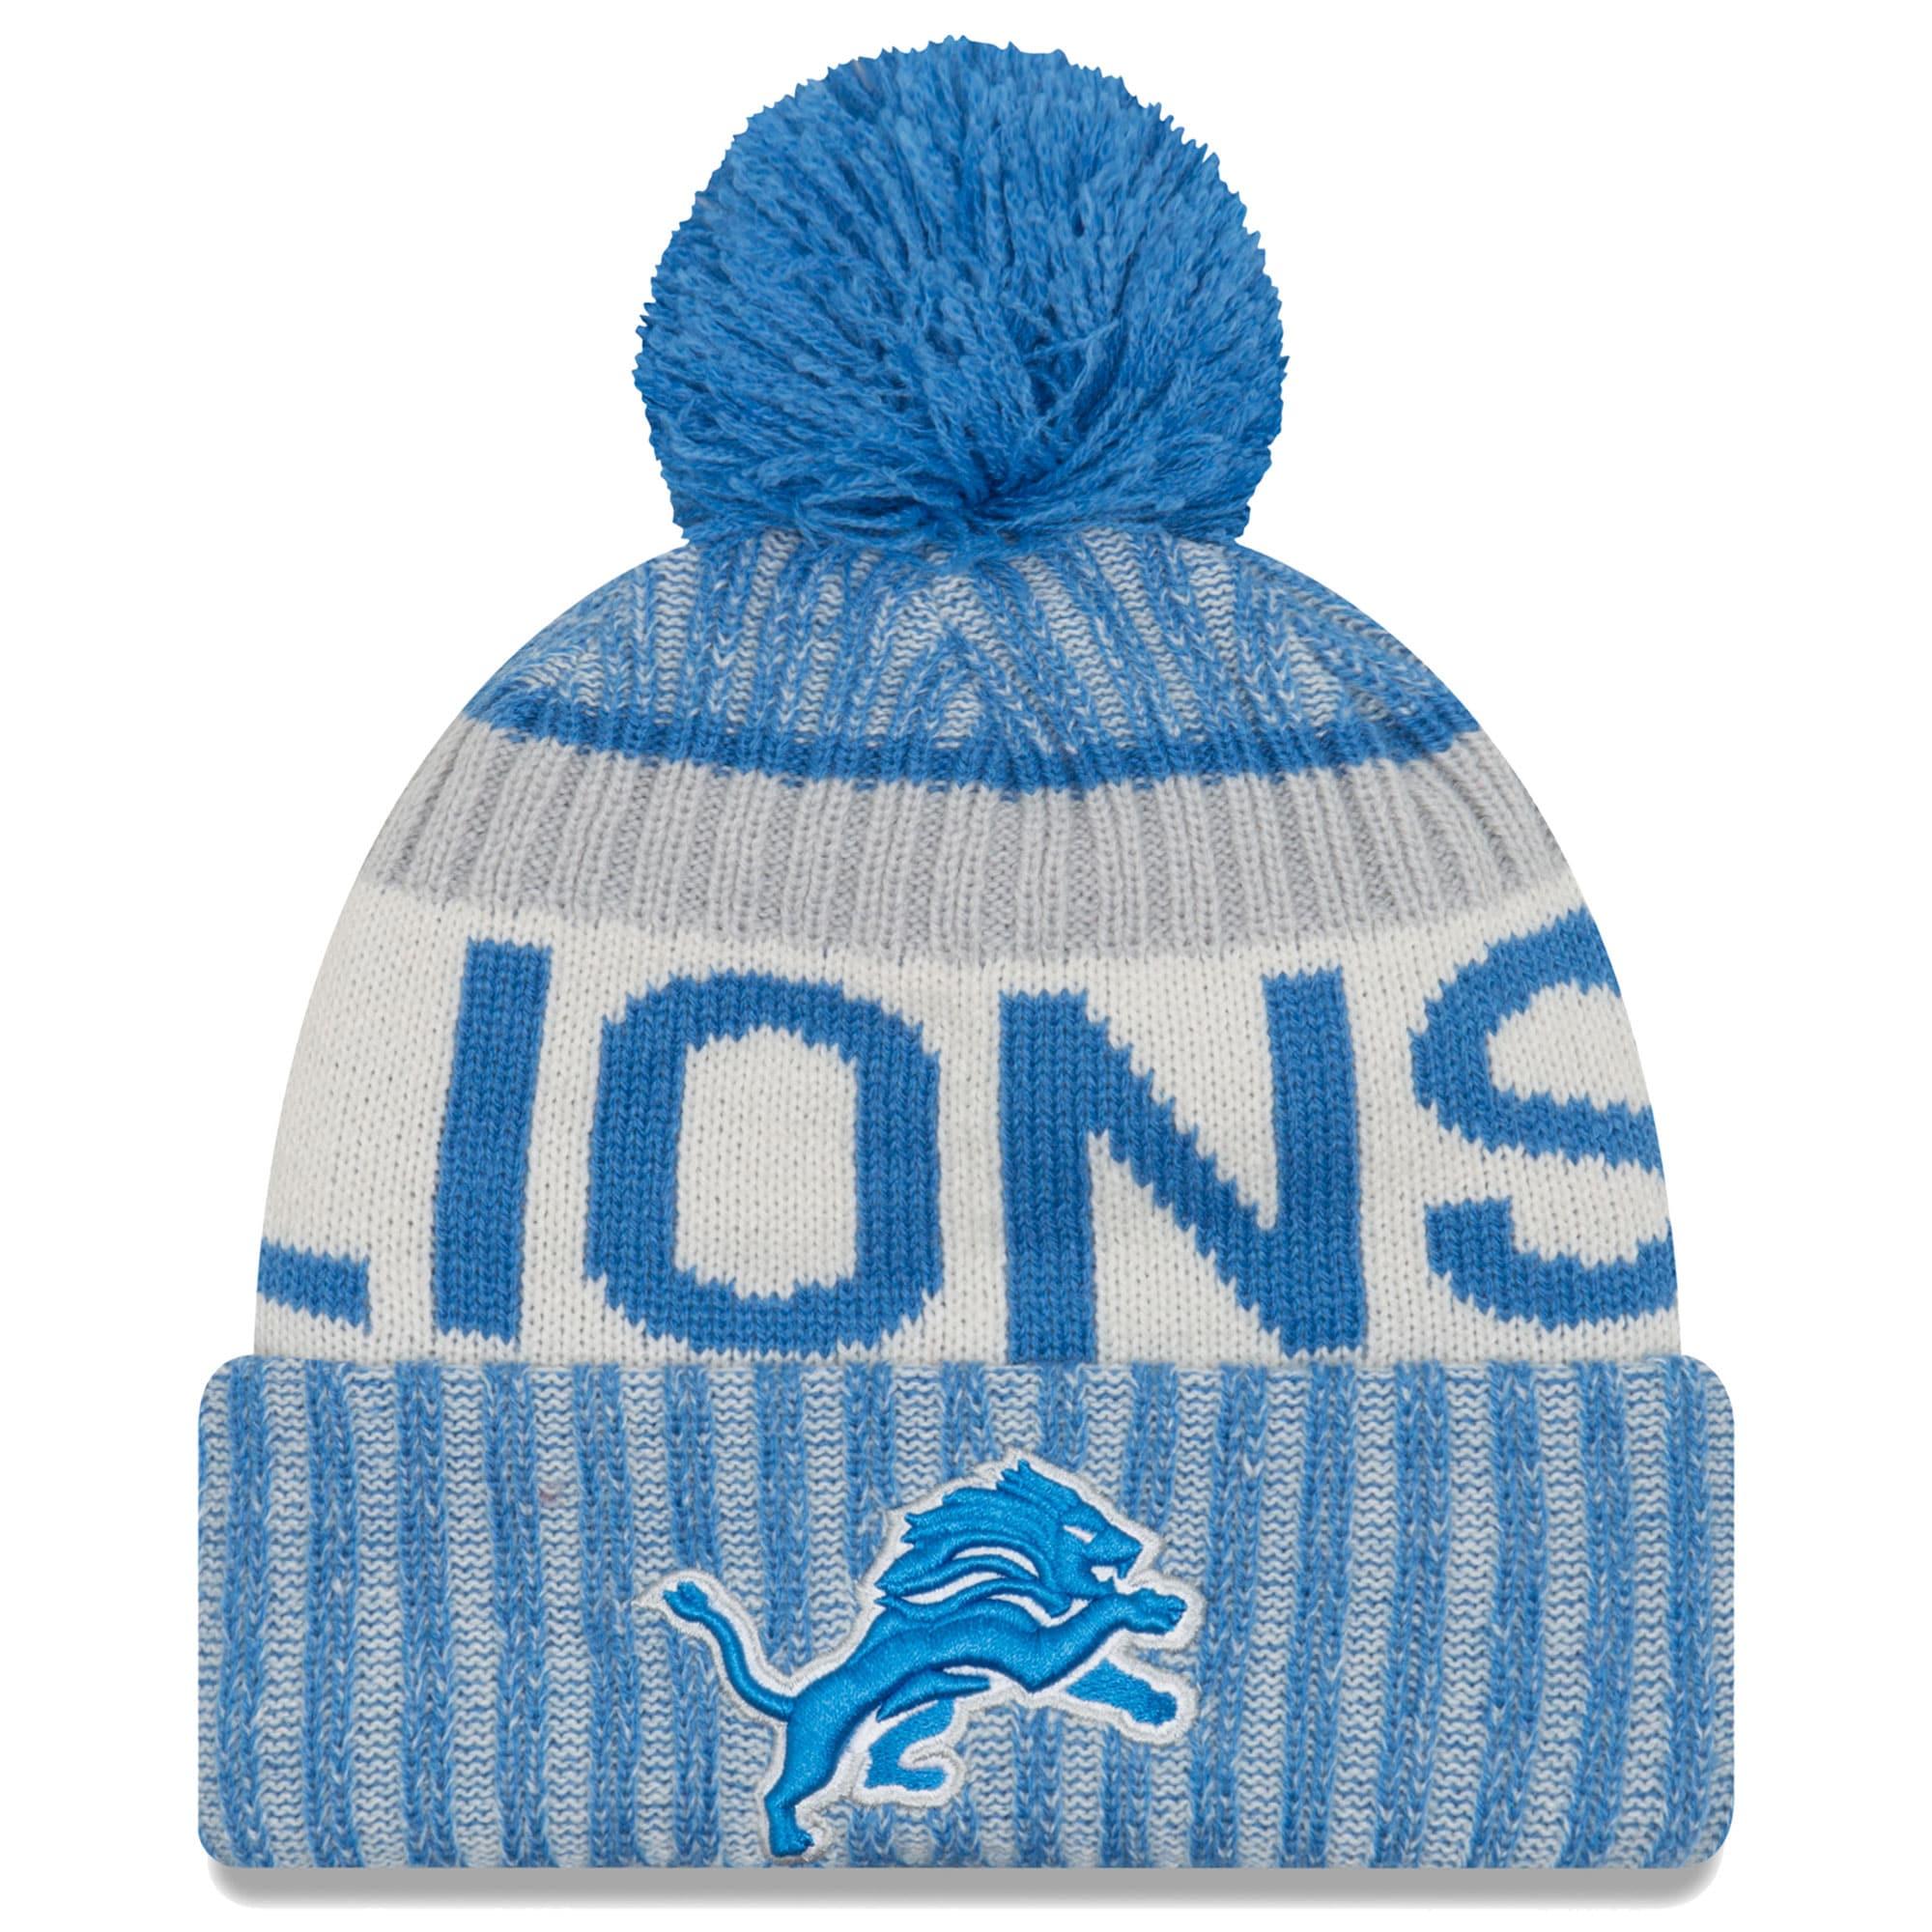 Detroit Lions New Era 2017 Sideline Official Sport Knit Hat - Blue